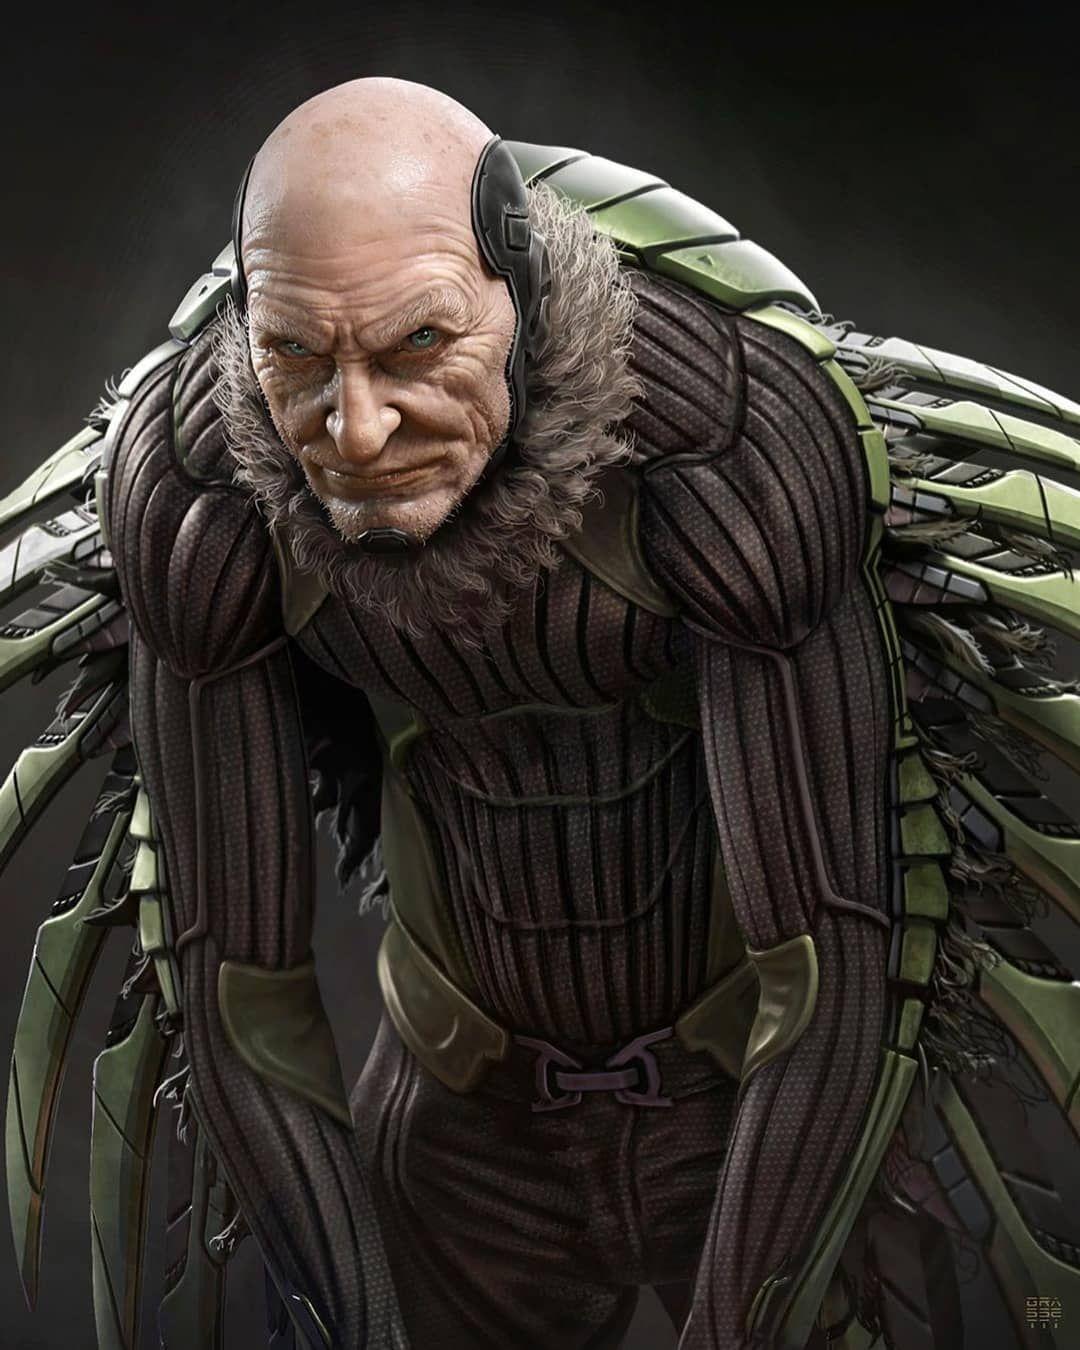 Super Realistic Arts Who Is Your Favorite Spider Man Villain Credit Rafagrassetti Follow Comics Marvel Superheroes Art Marvel Villains Vulture Marvel